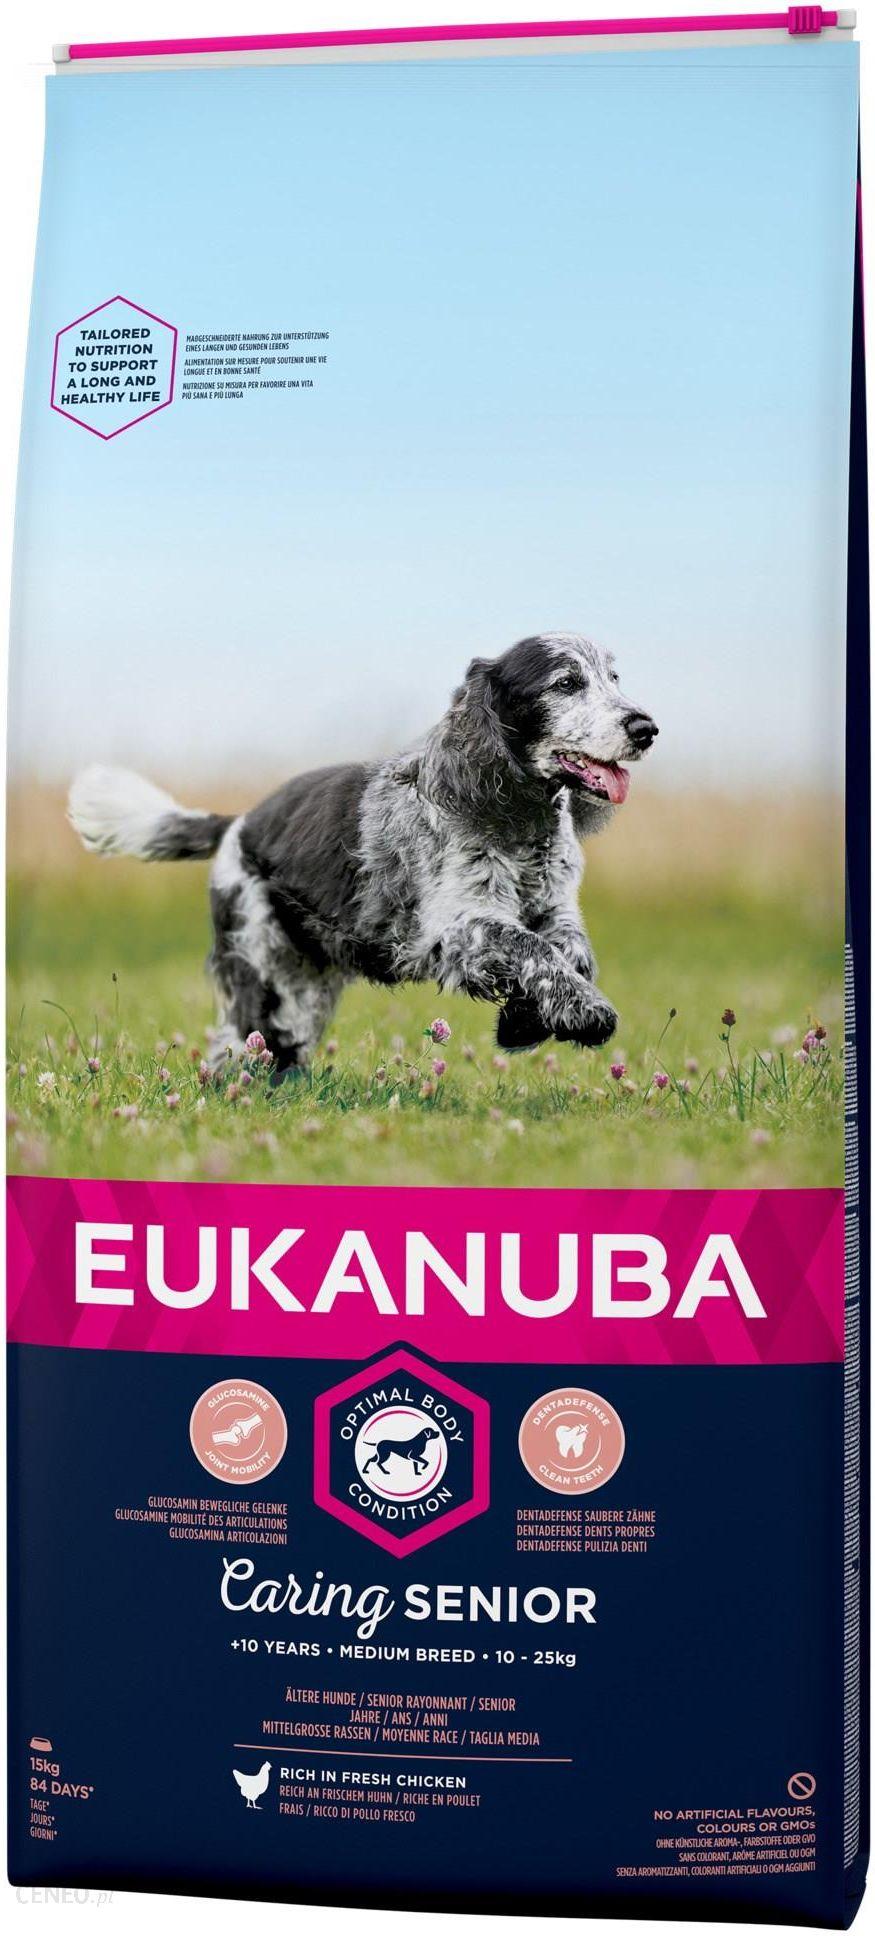 EUKANUBA Caring Senior Medium Breed bogata w świeżego kurczaka 15kg